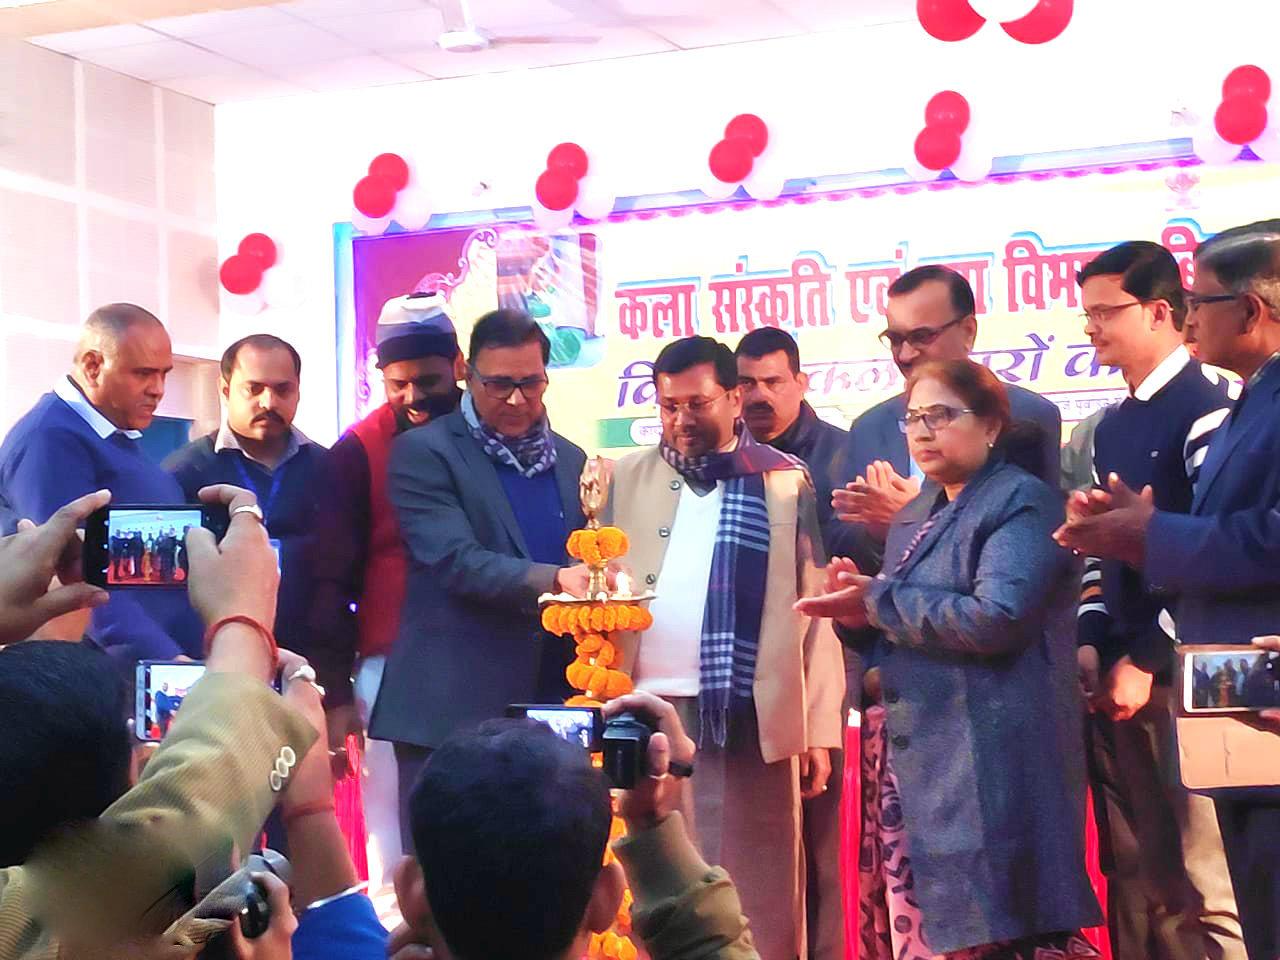 Dr.Madhepuri along with SC-ST Minister Dr.Ramesh Rishidev, ADM Shiv Kumar Shaiv, DDC Mukesh Kumar, NDC Rajnesh Kumar Roy, Dr.Shanti Yadav & others attending the inaugural function of Yuva Utsav organised by Kala, Sanskrit & Yuva Vibhag of Bihar Govt. at Bhupendra Kala Bhawan.